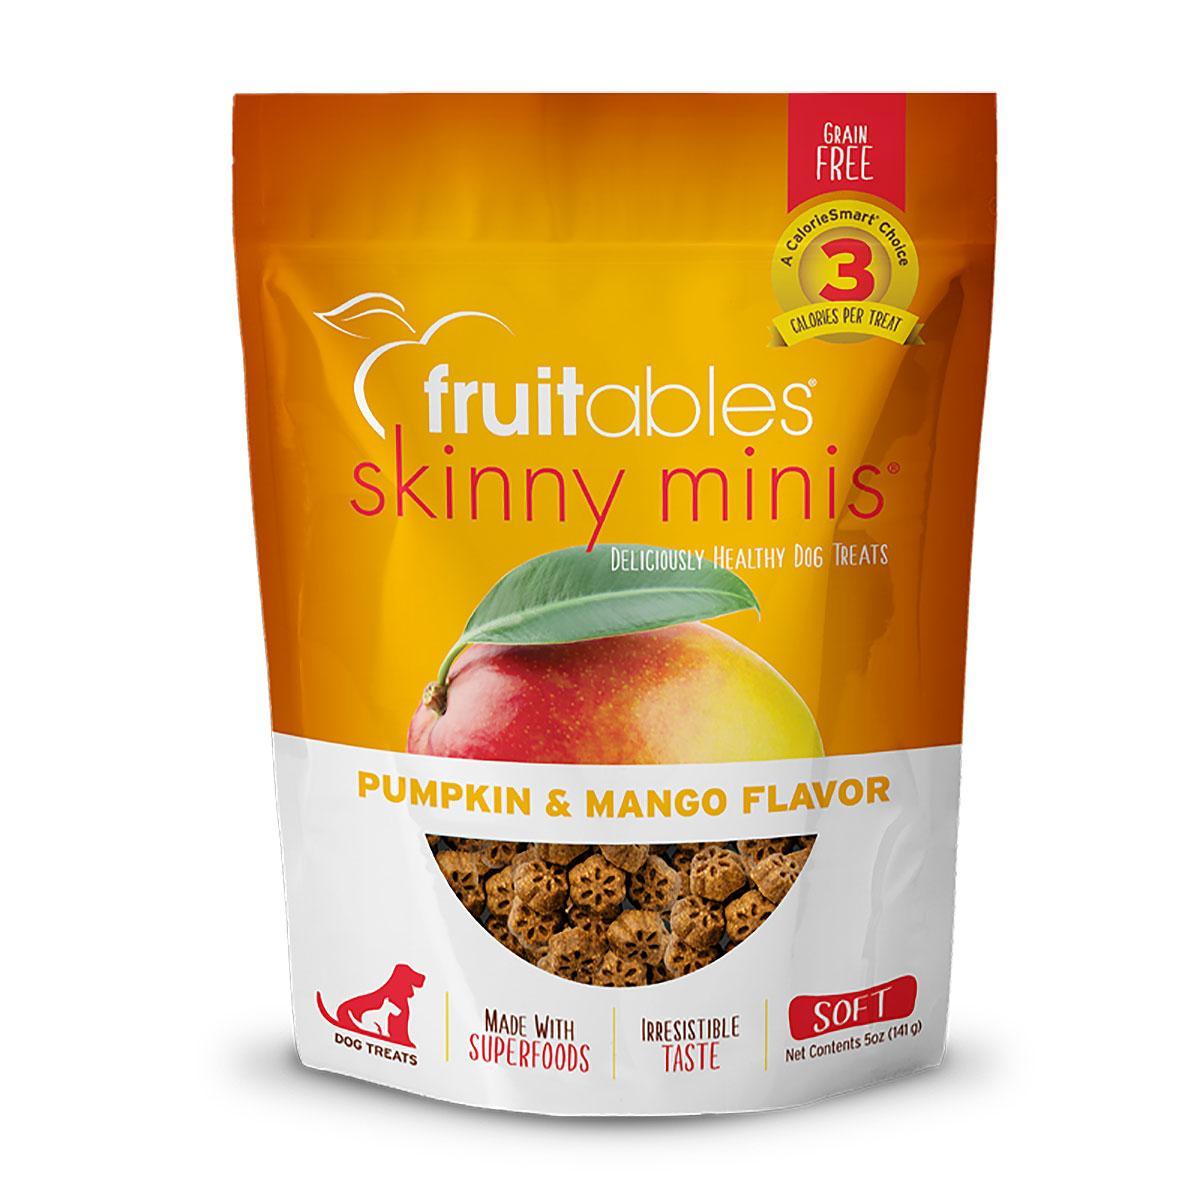 Fruitables Skinny Minis Dog Treat - Pumpkin/Mango